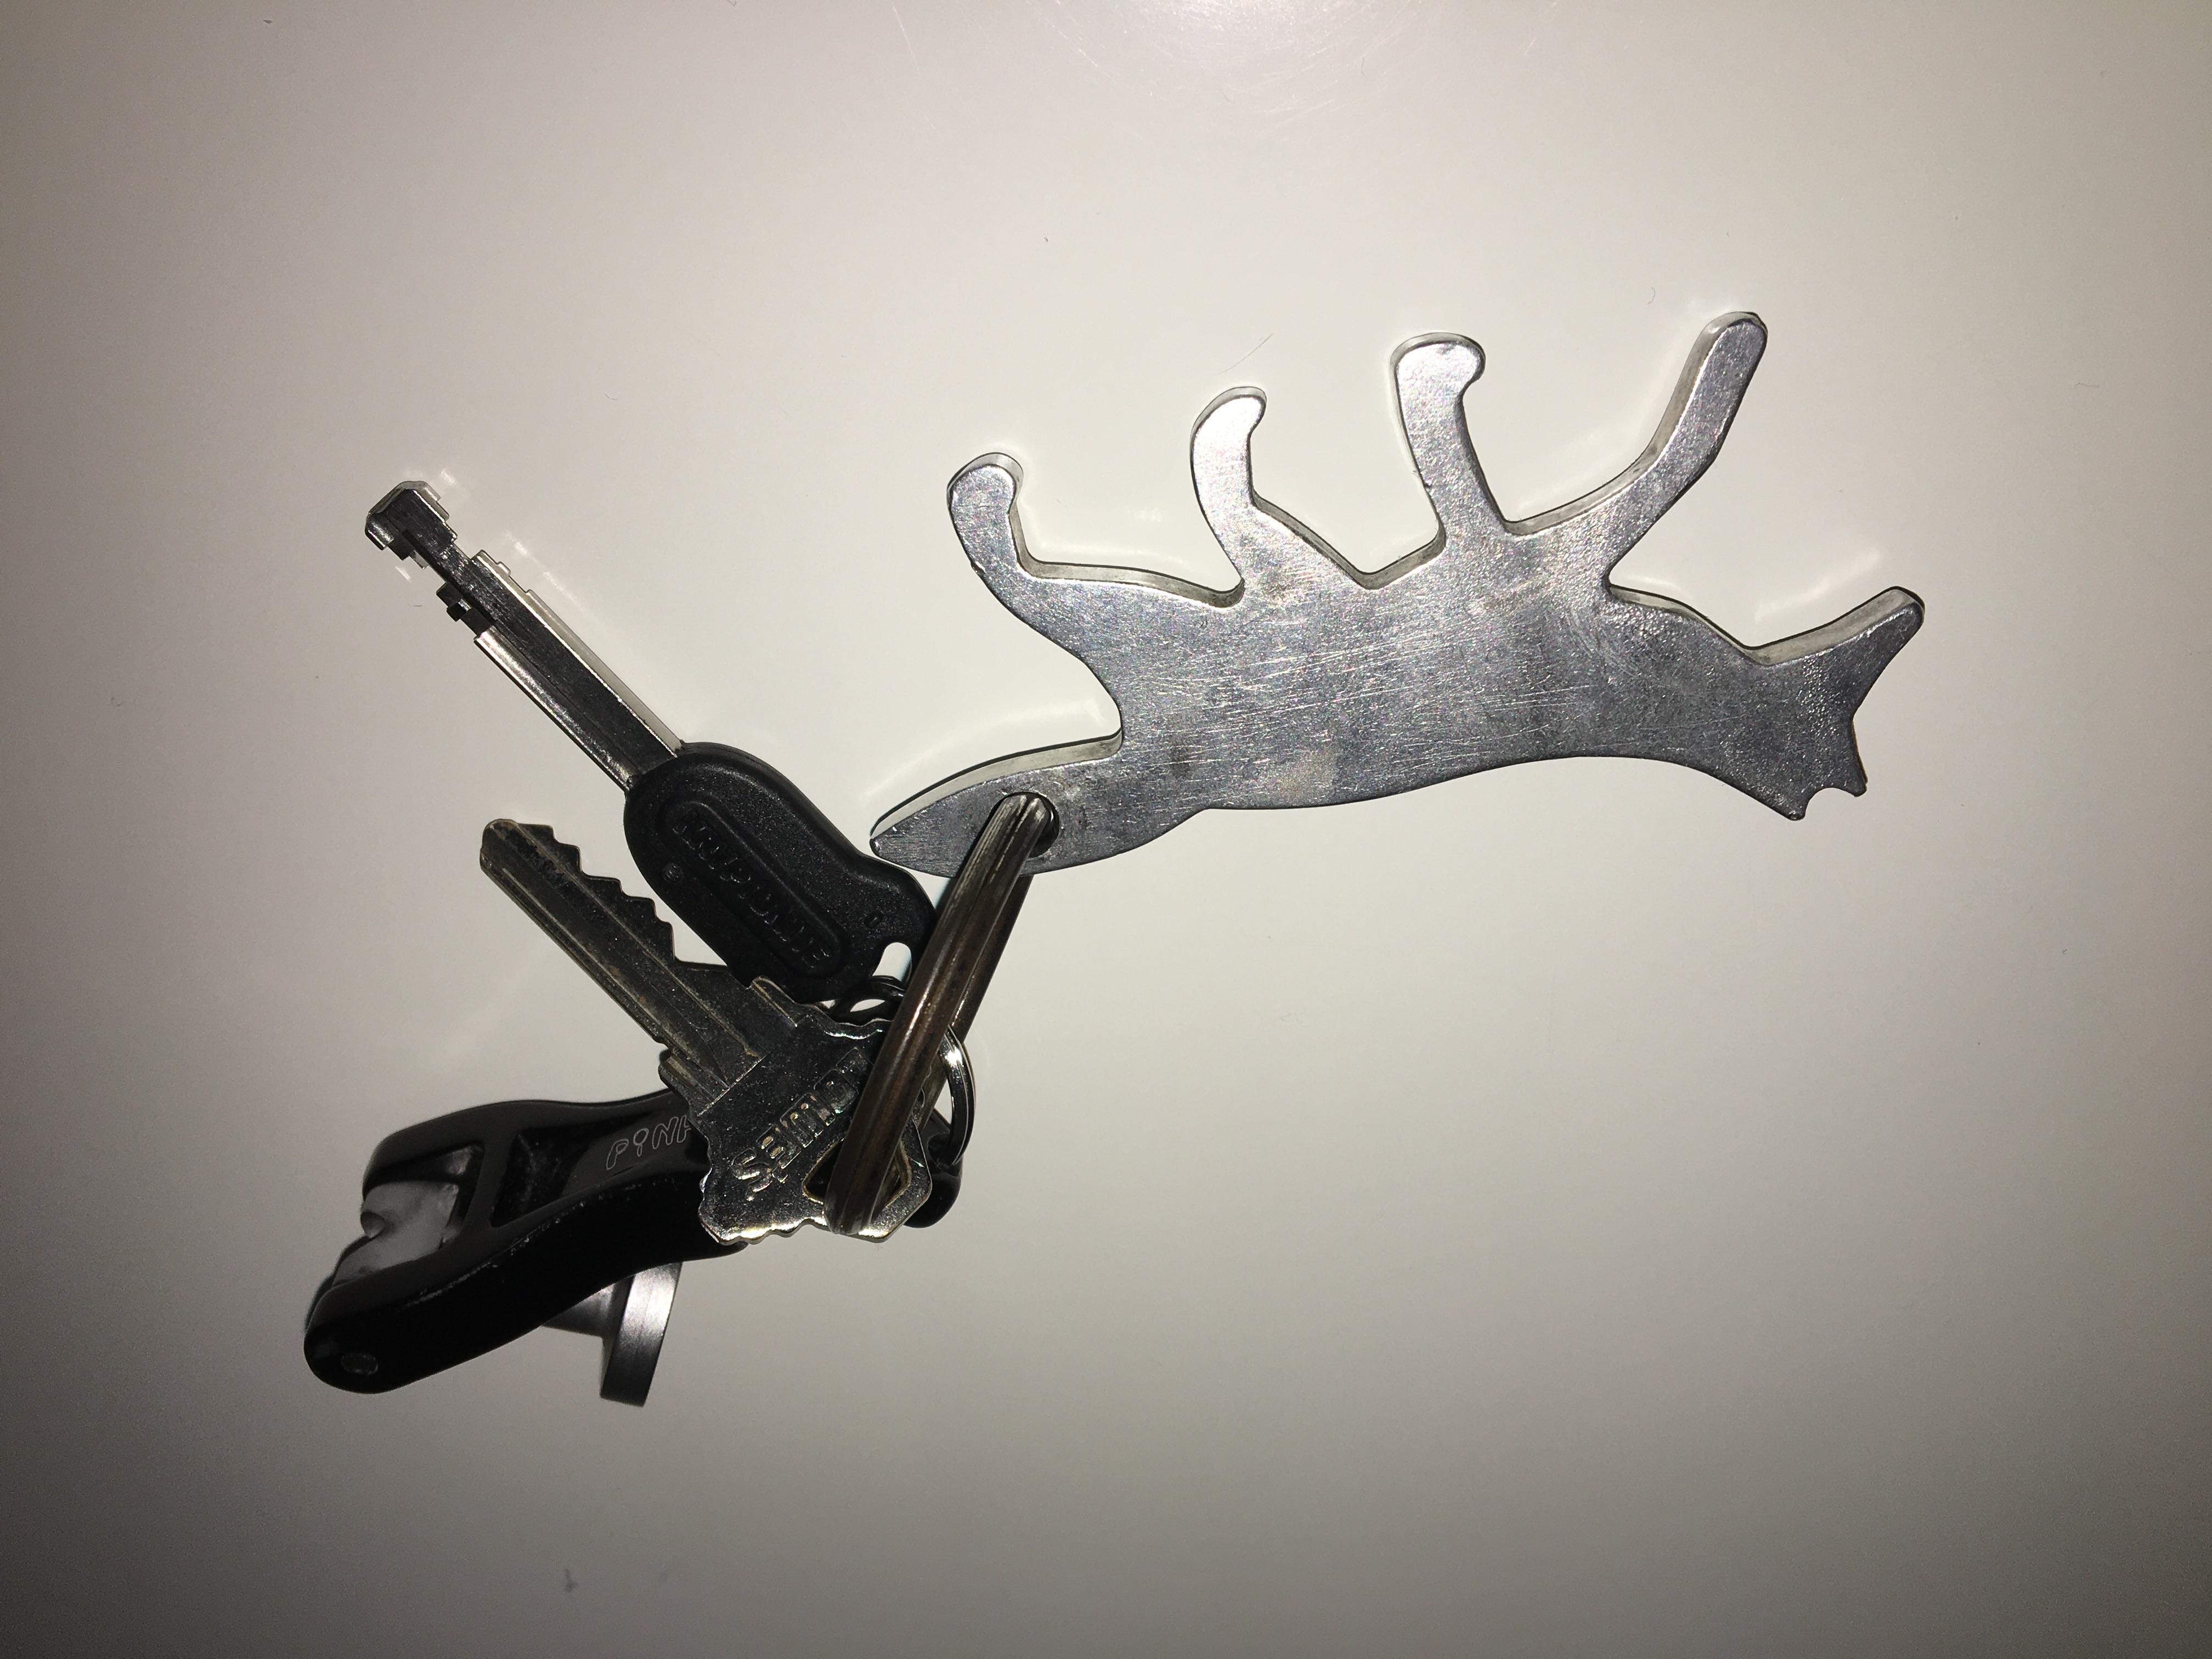 Fox buddy on my keychain